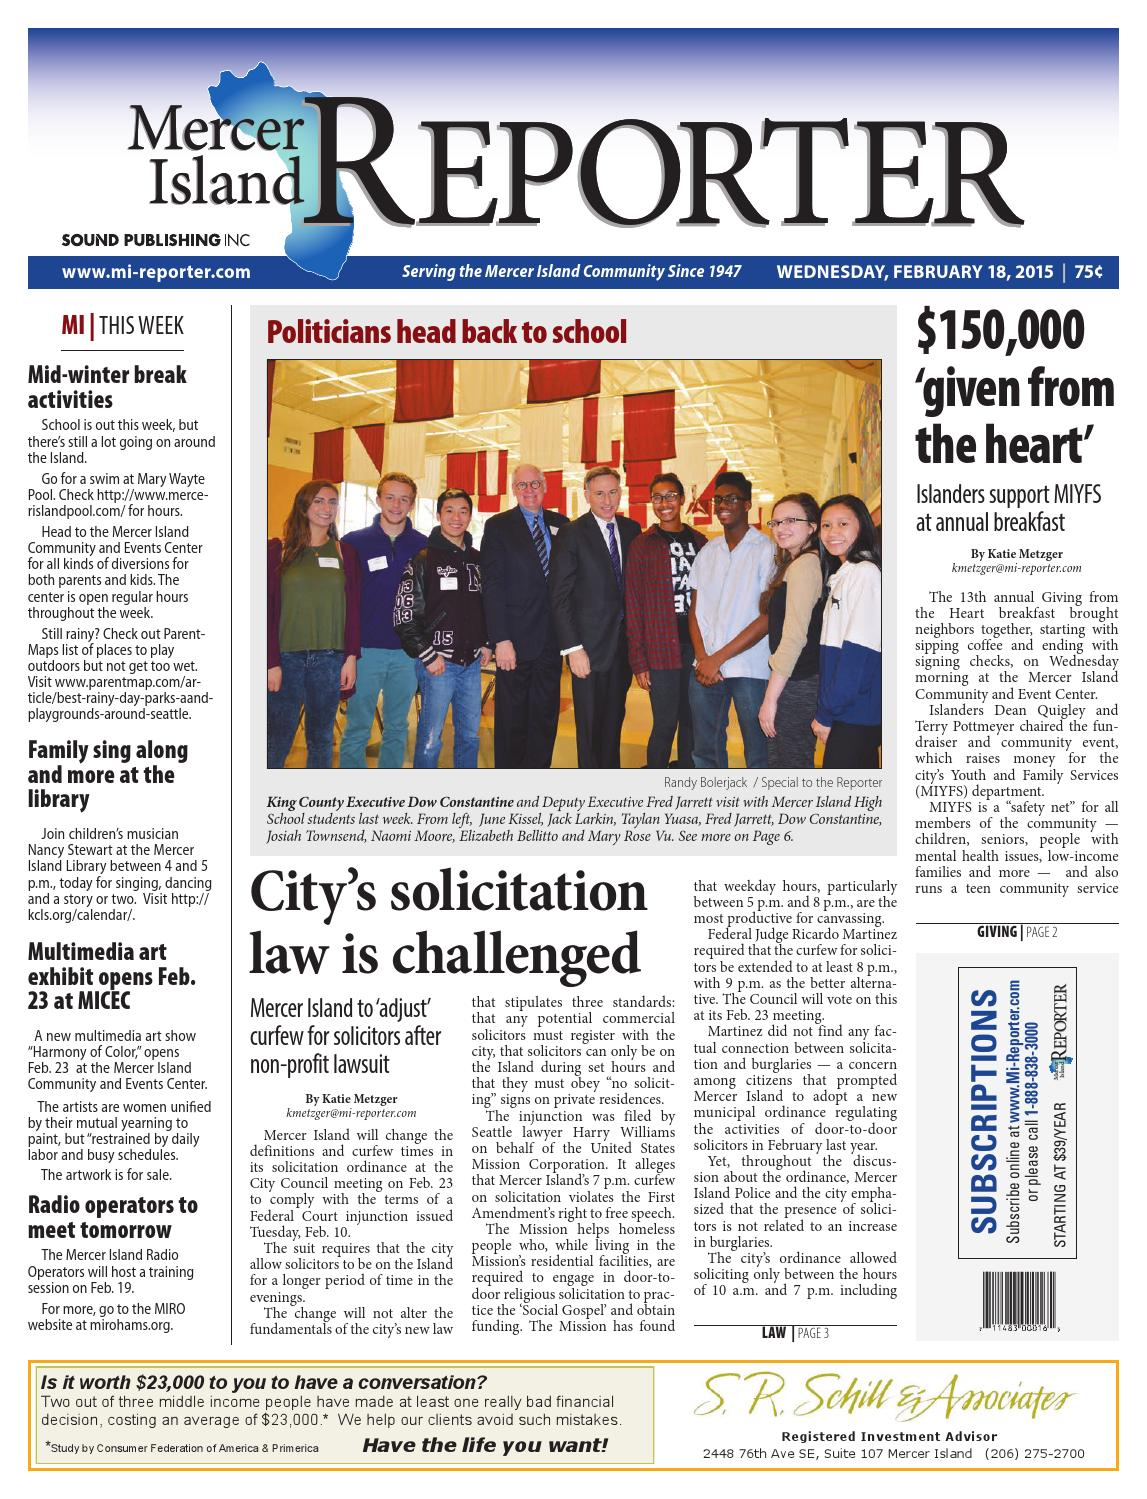 Mercer Island Reporter February 18 2015 By Sound Publishing Issuu